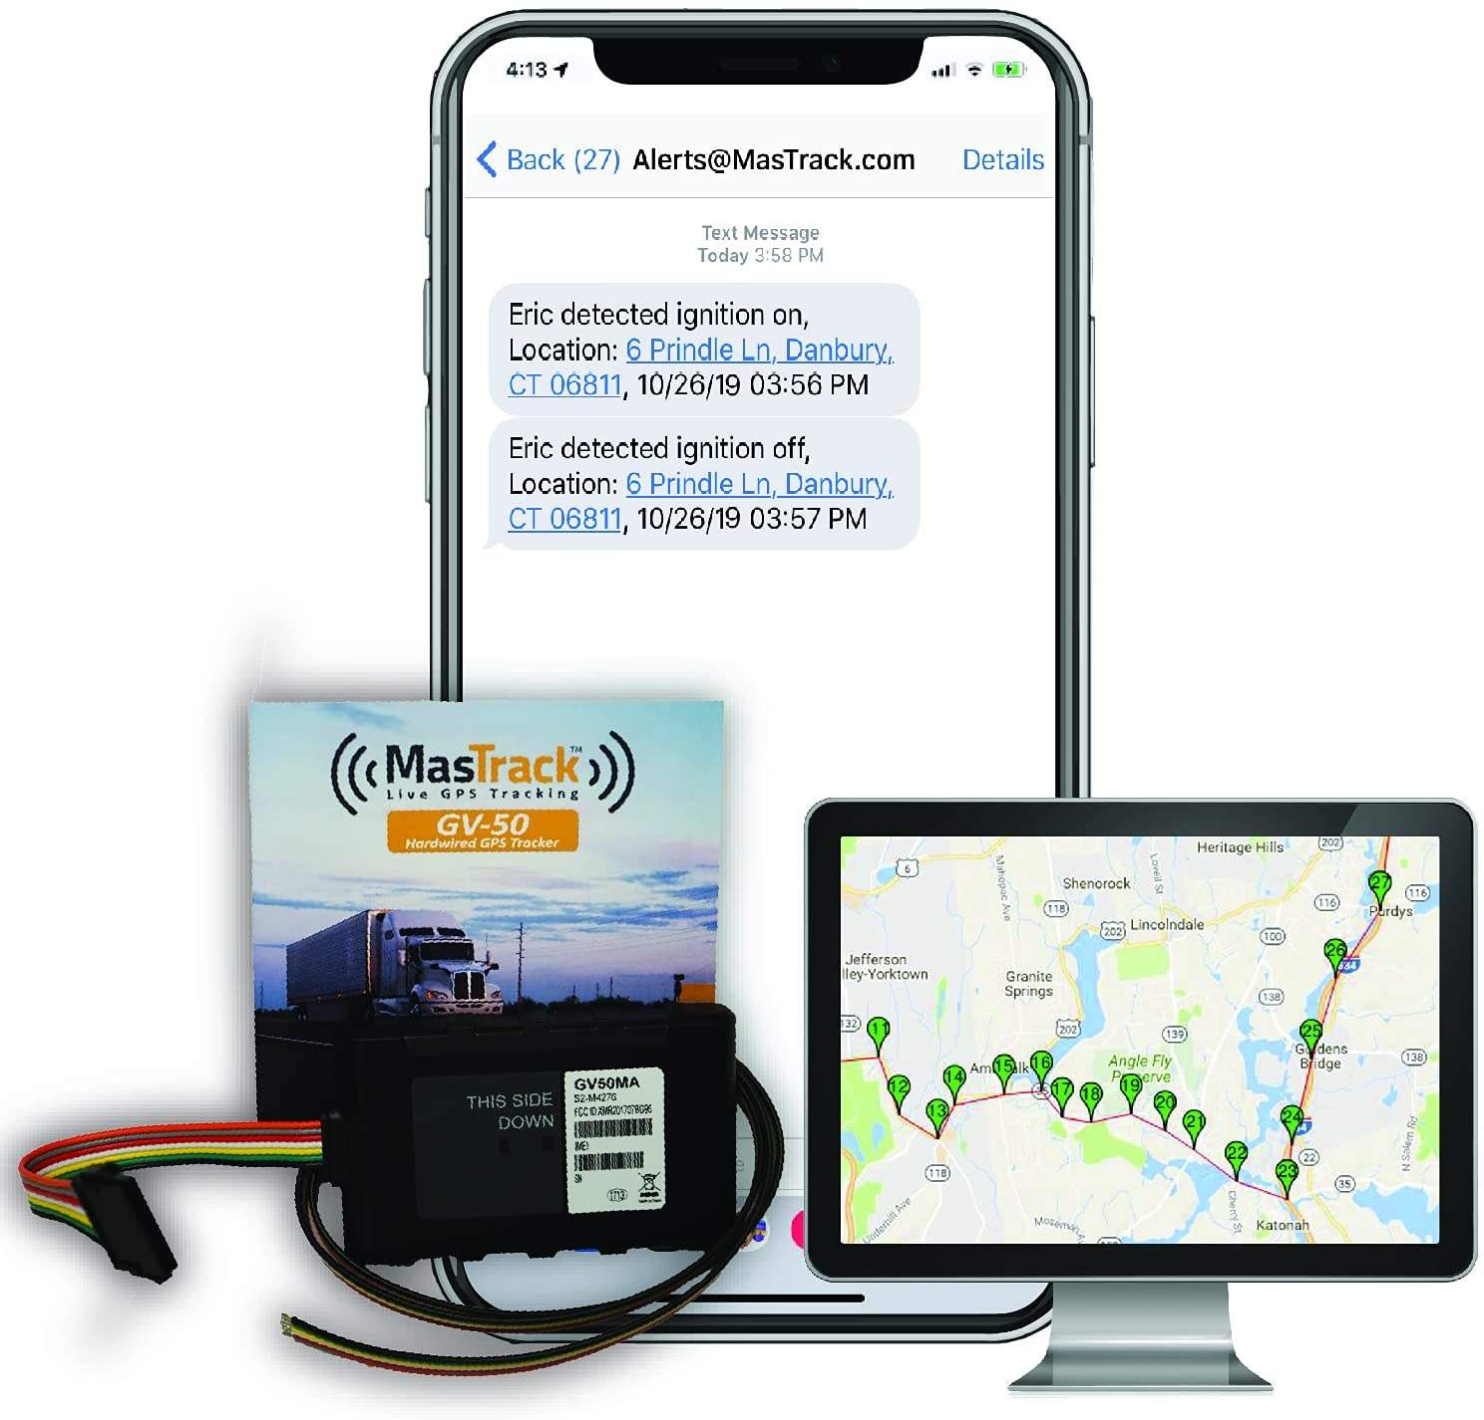 Mas Track - Hardwired Live GPS Vehicle Tracker